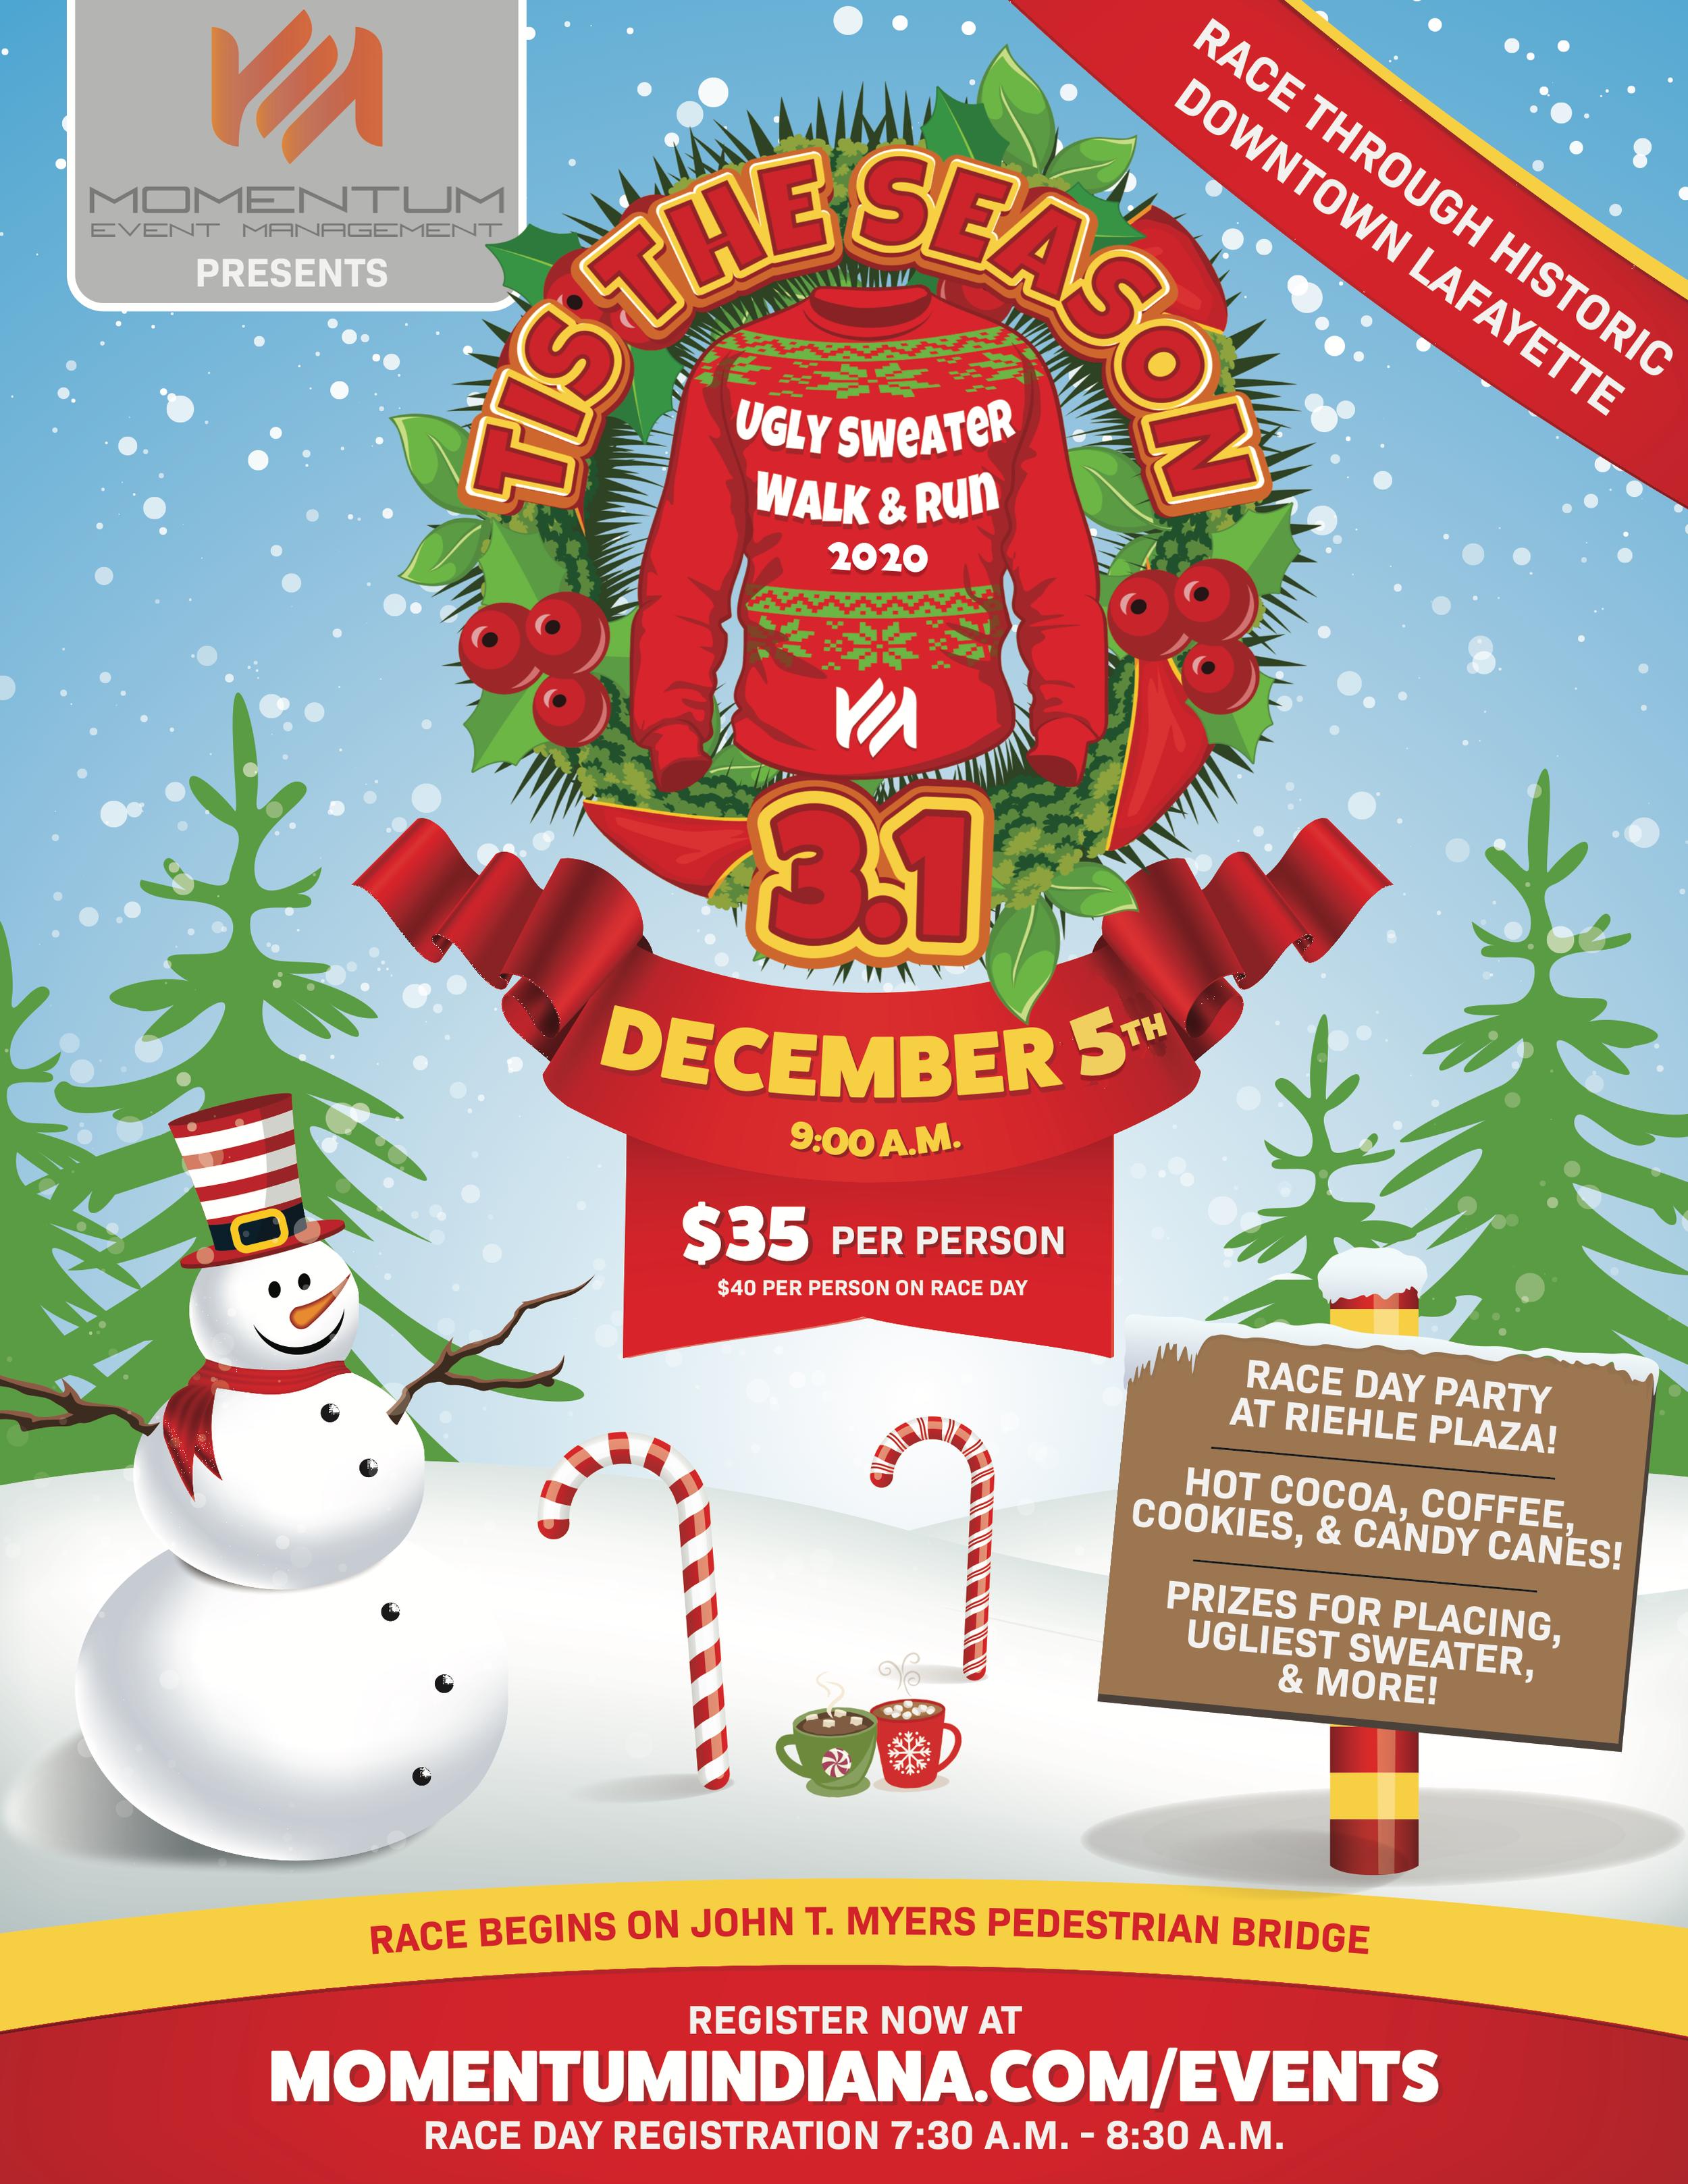 2020 Downtown Christmas Walk: Vendor Registration Tis the Season 3.1 — Momentum Events